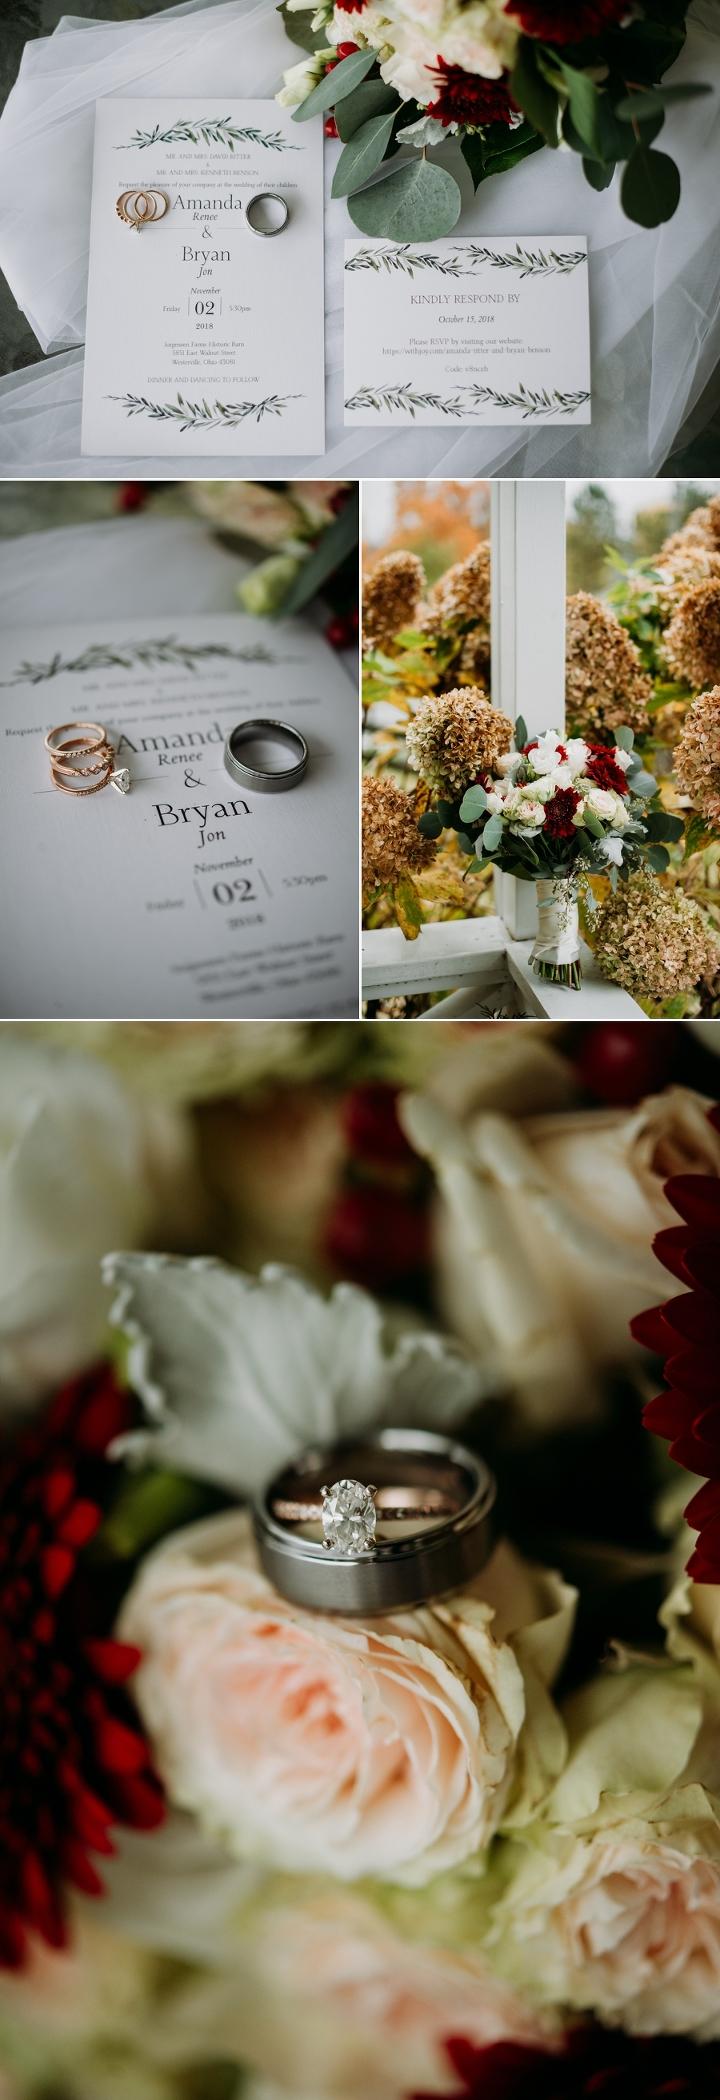 Amanda and Bryan Married 3